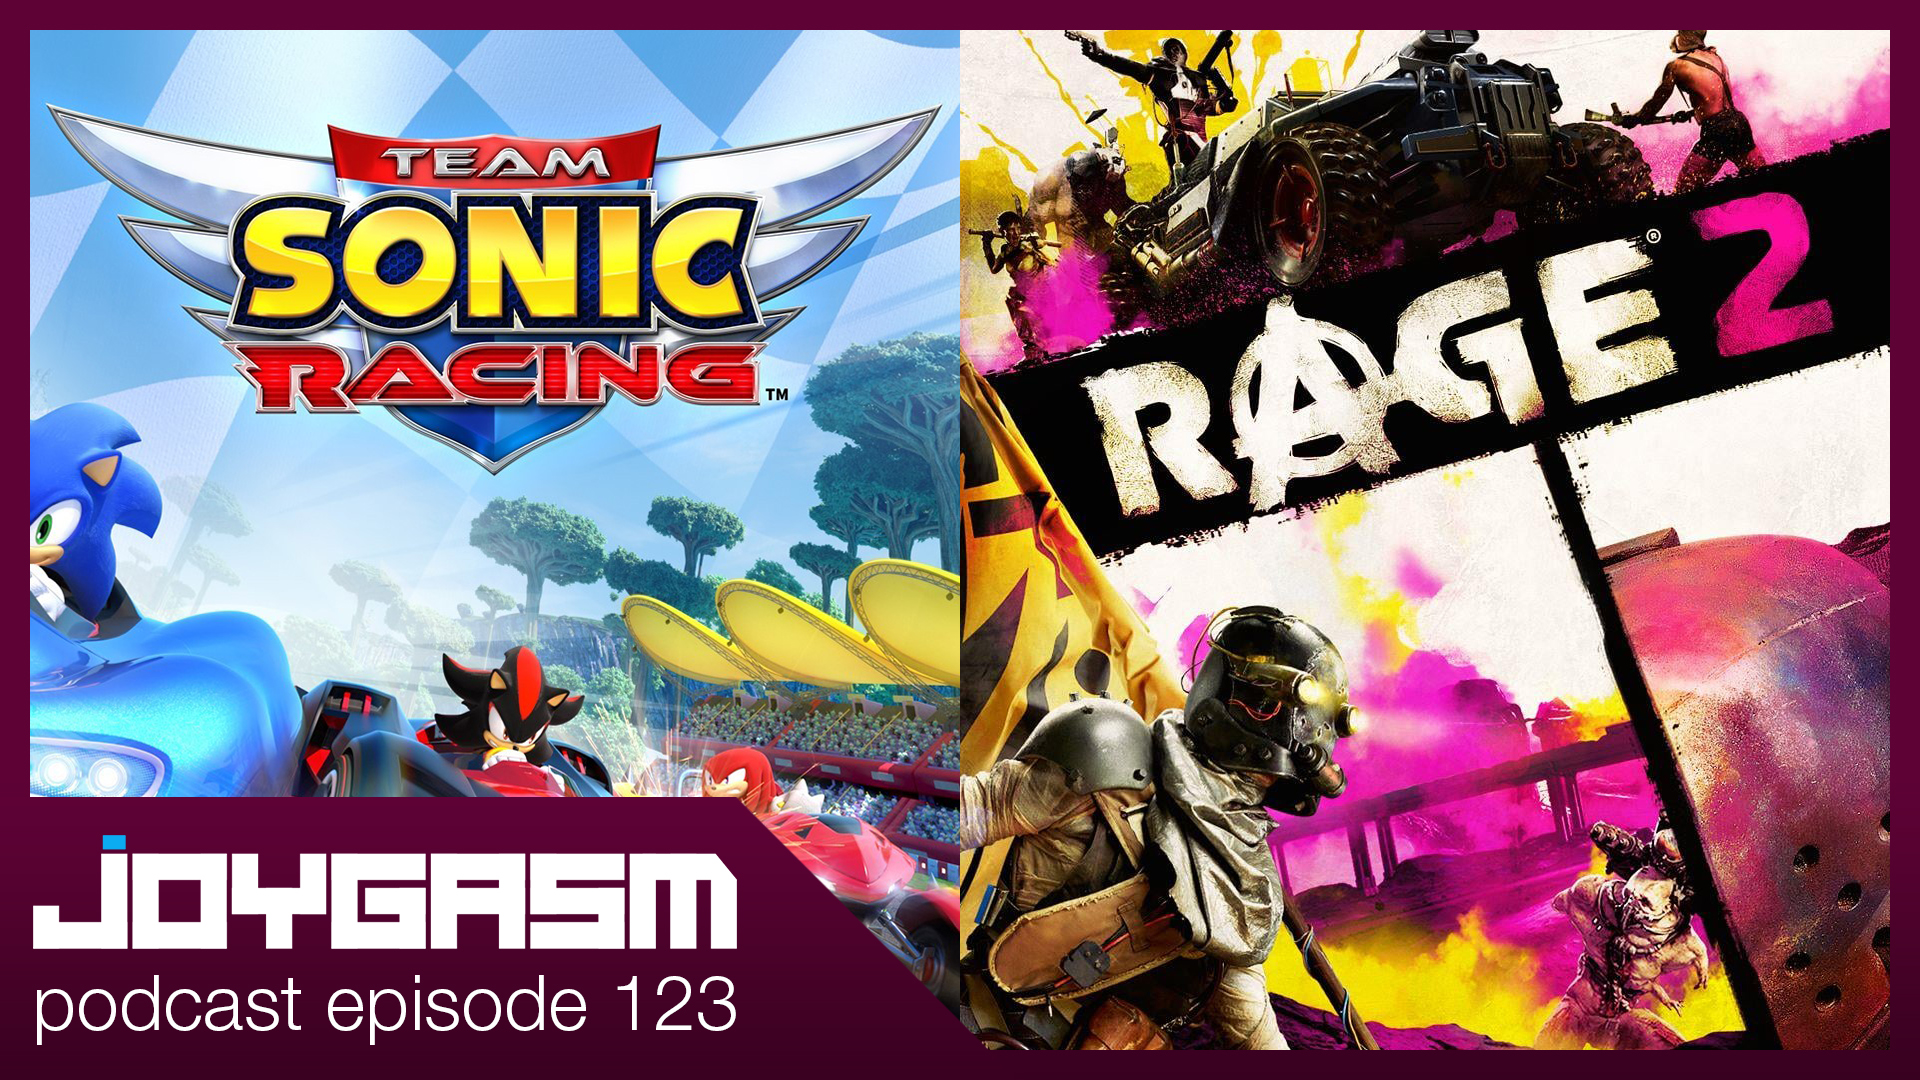 Ep. 123: Rage 2, Team Sonic Racing, & More